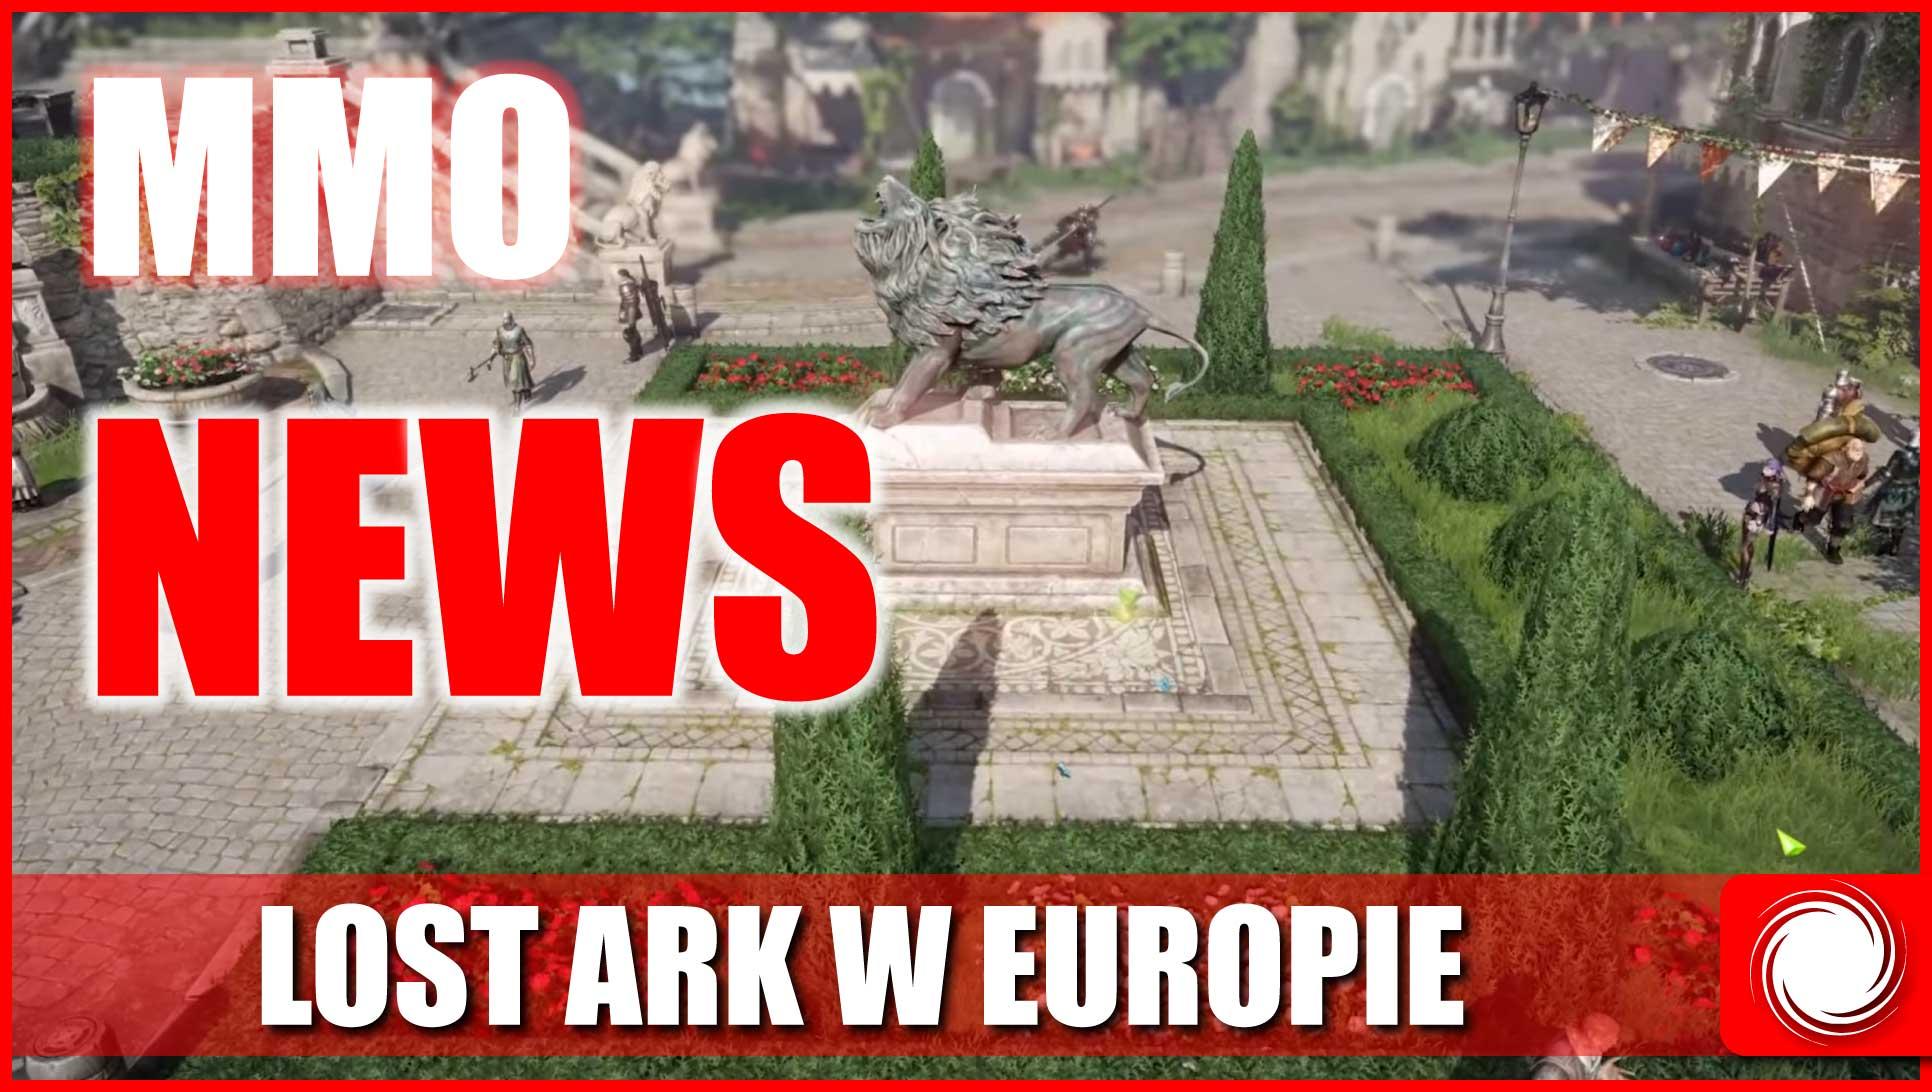 MMO NEWS Lost Ark wEuropie